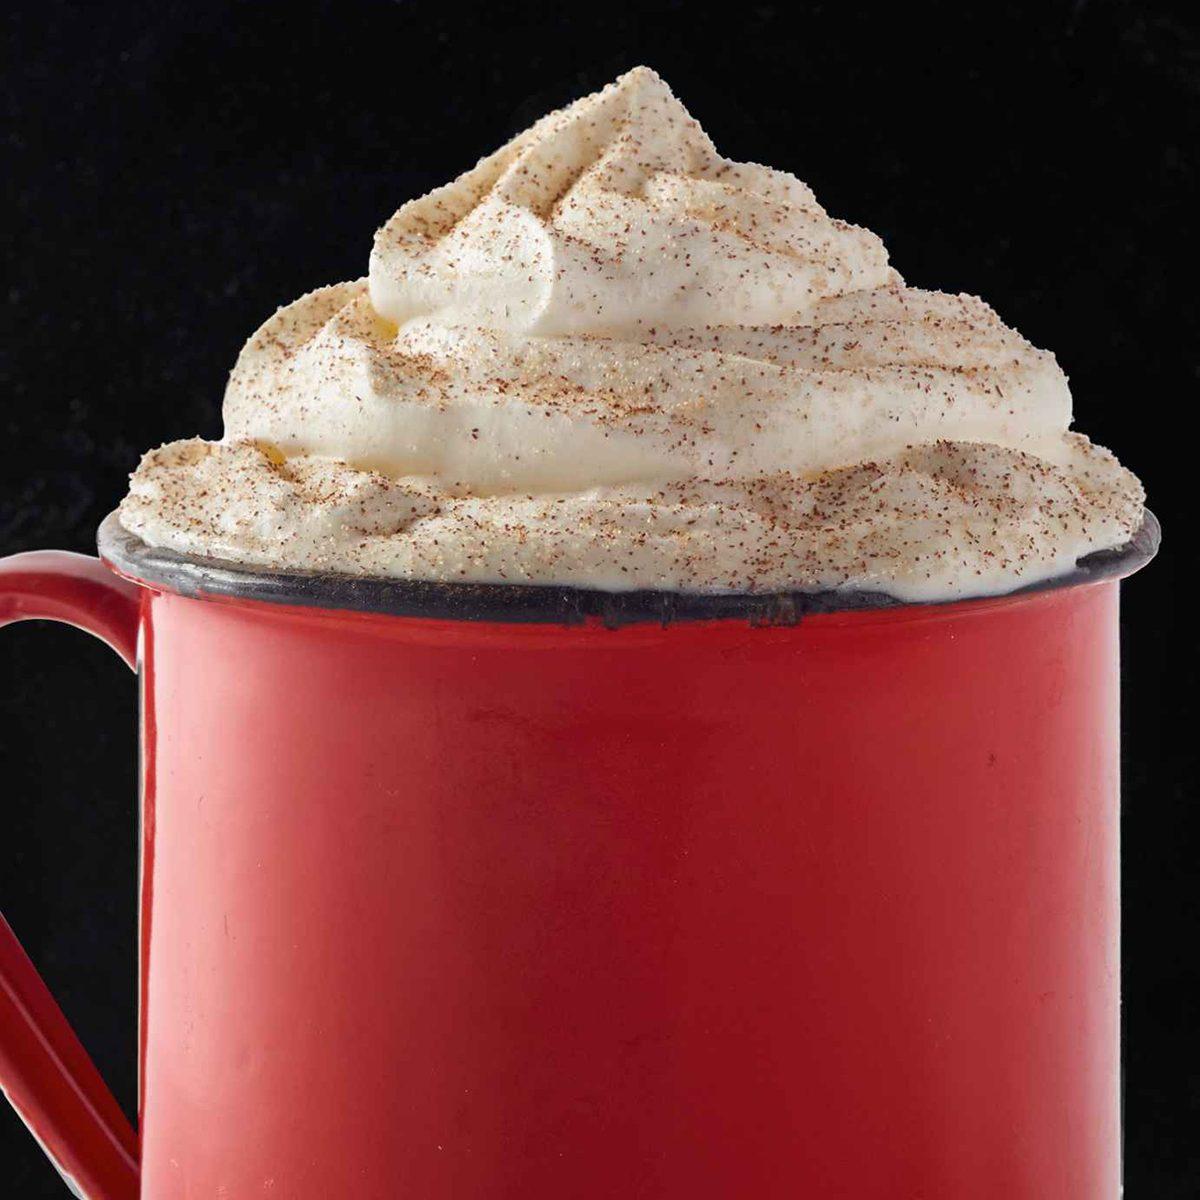 Starbucks Snickerdoodle Hot Cocoa